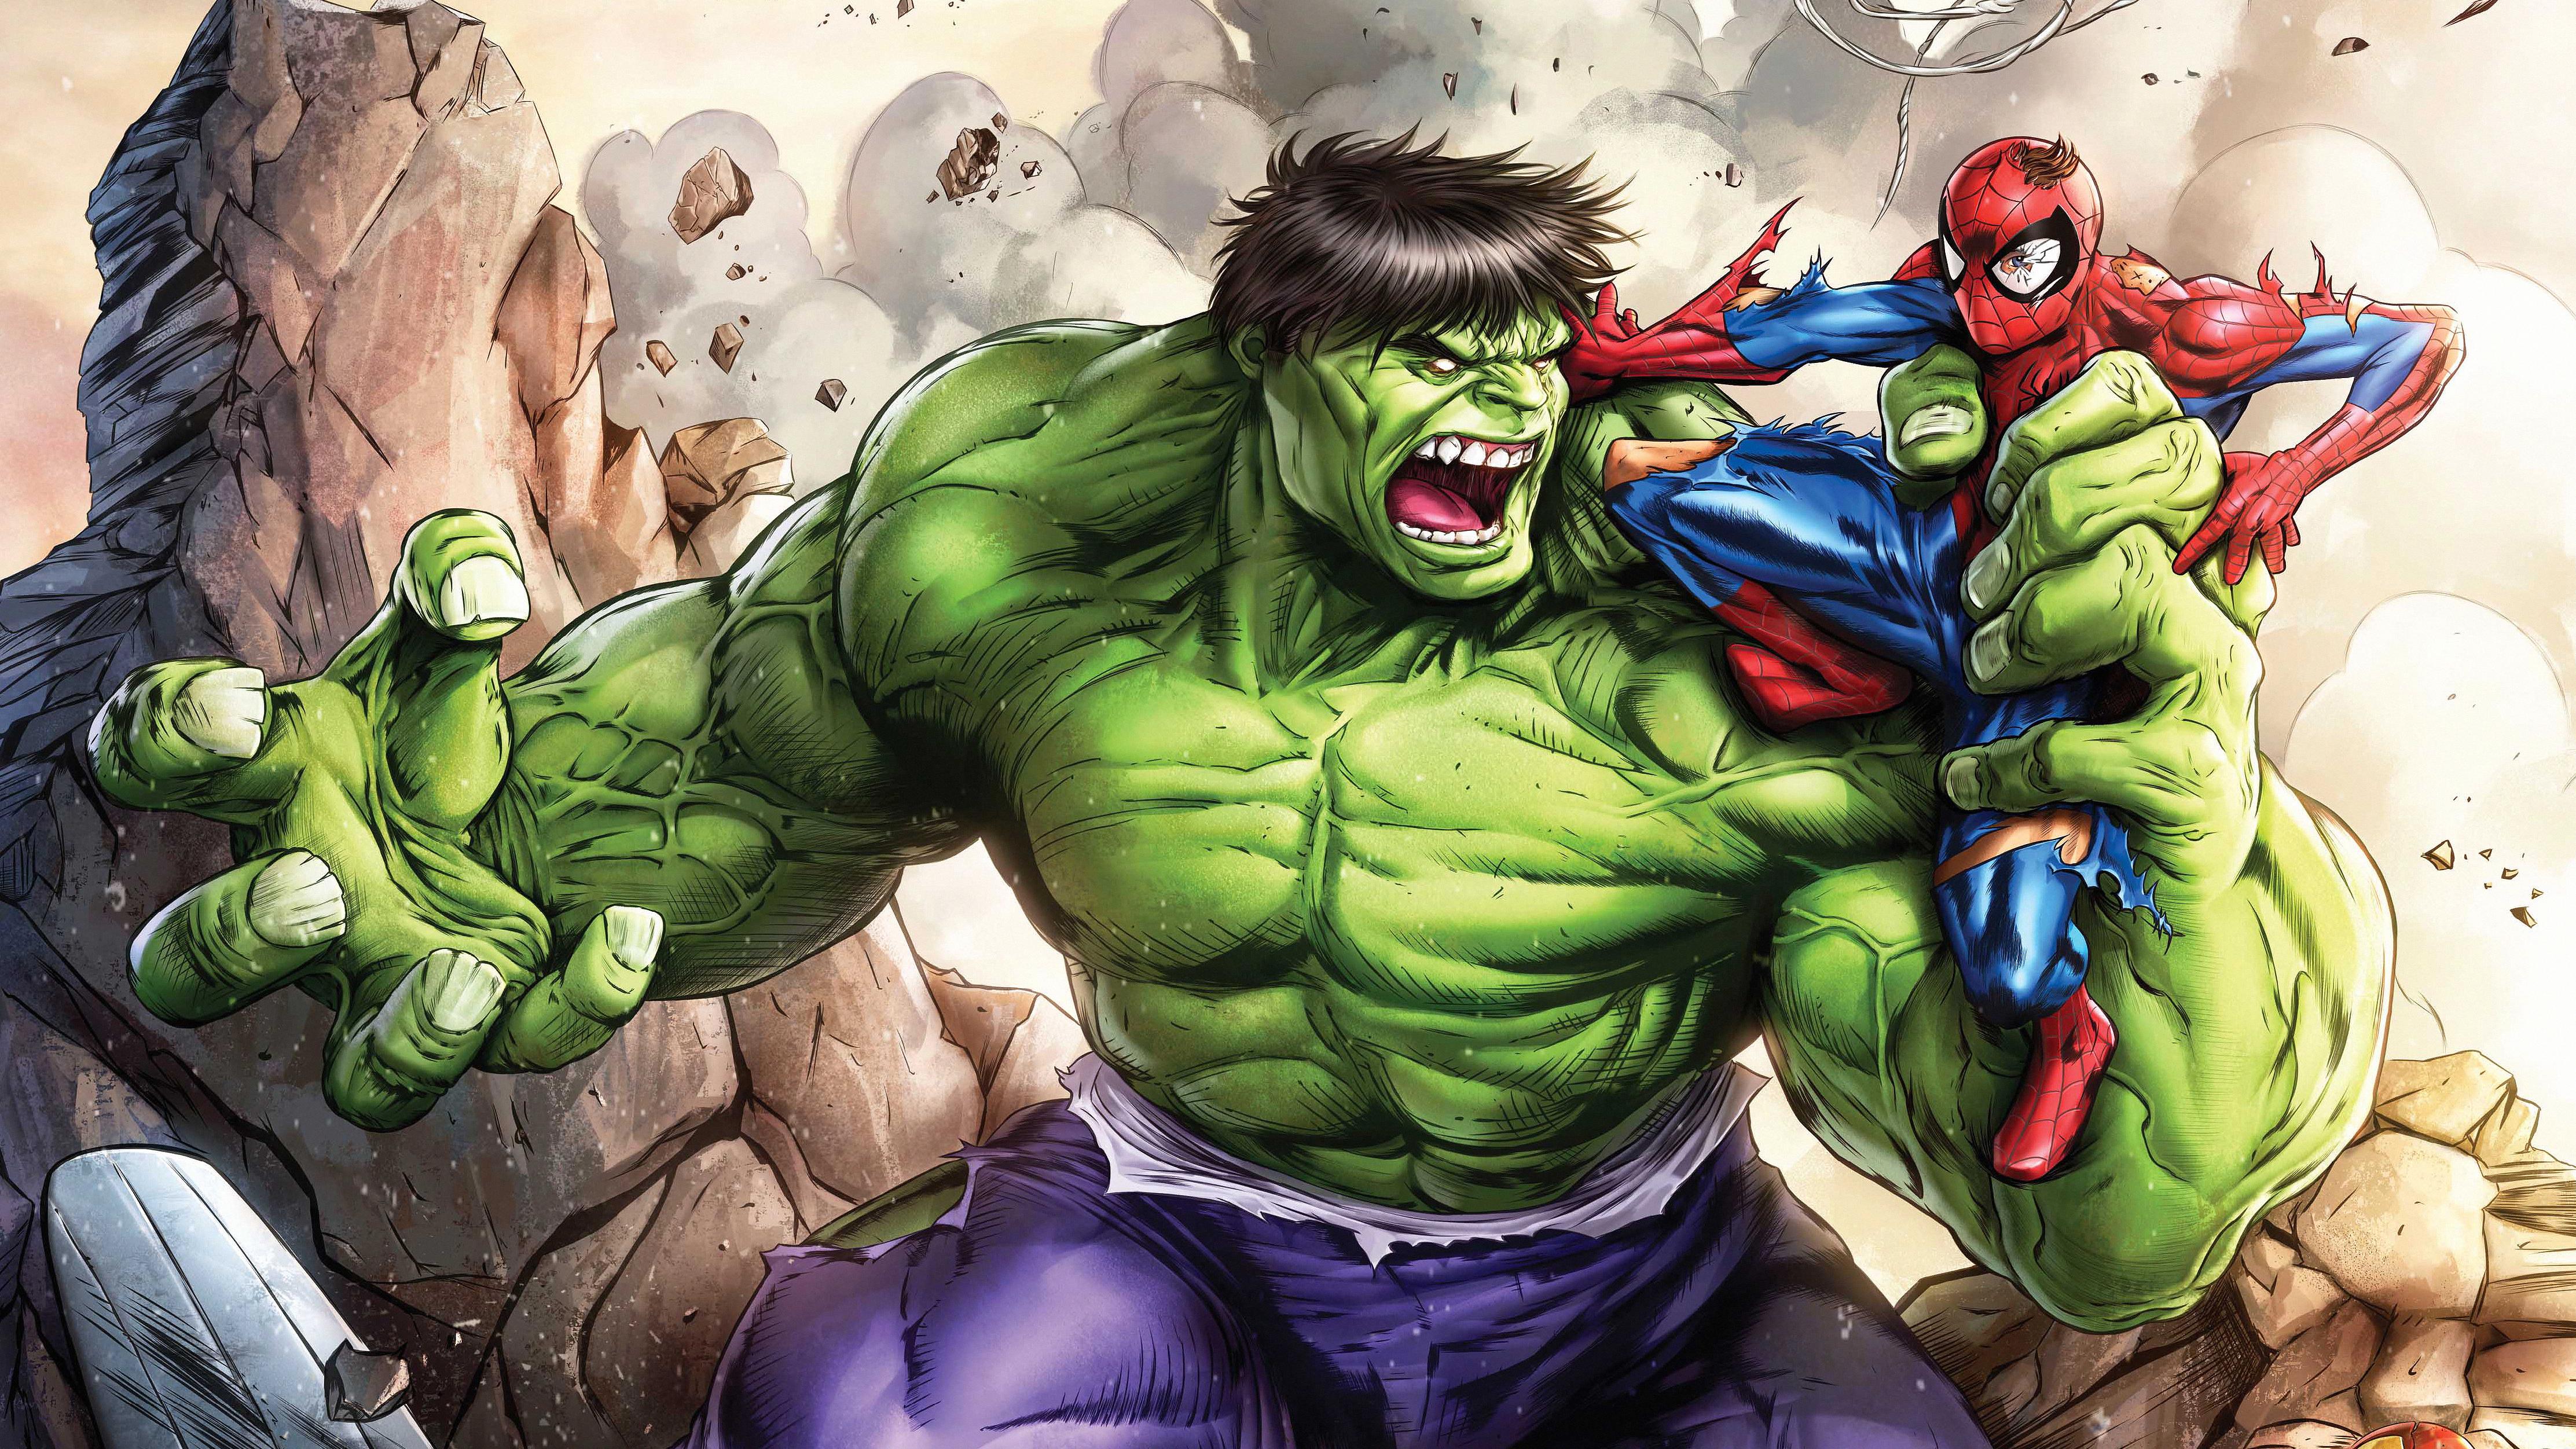 hulk vs spiderman artwork 1576095739 - Hulk Vs Spiderman Artwork - ironman vs hulk art wallpaper hd 4k, Hulk Vs Spiderman wallpaper hd 4k, Hulk Vs Spiderman art wallpaper hd 4k